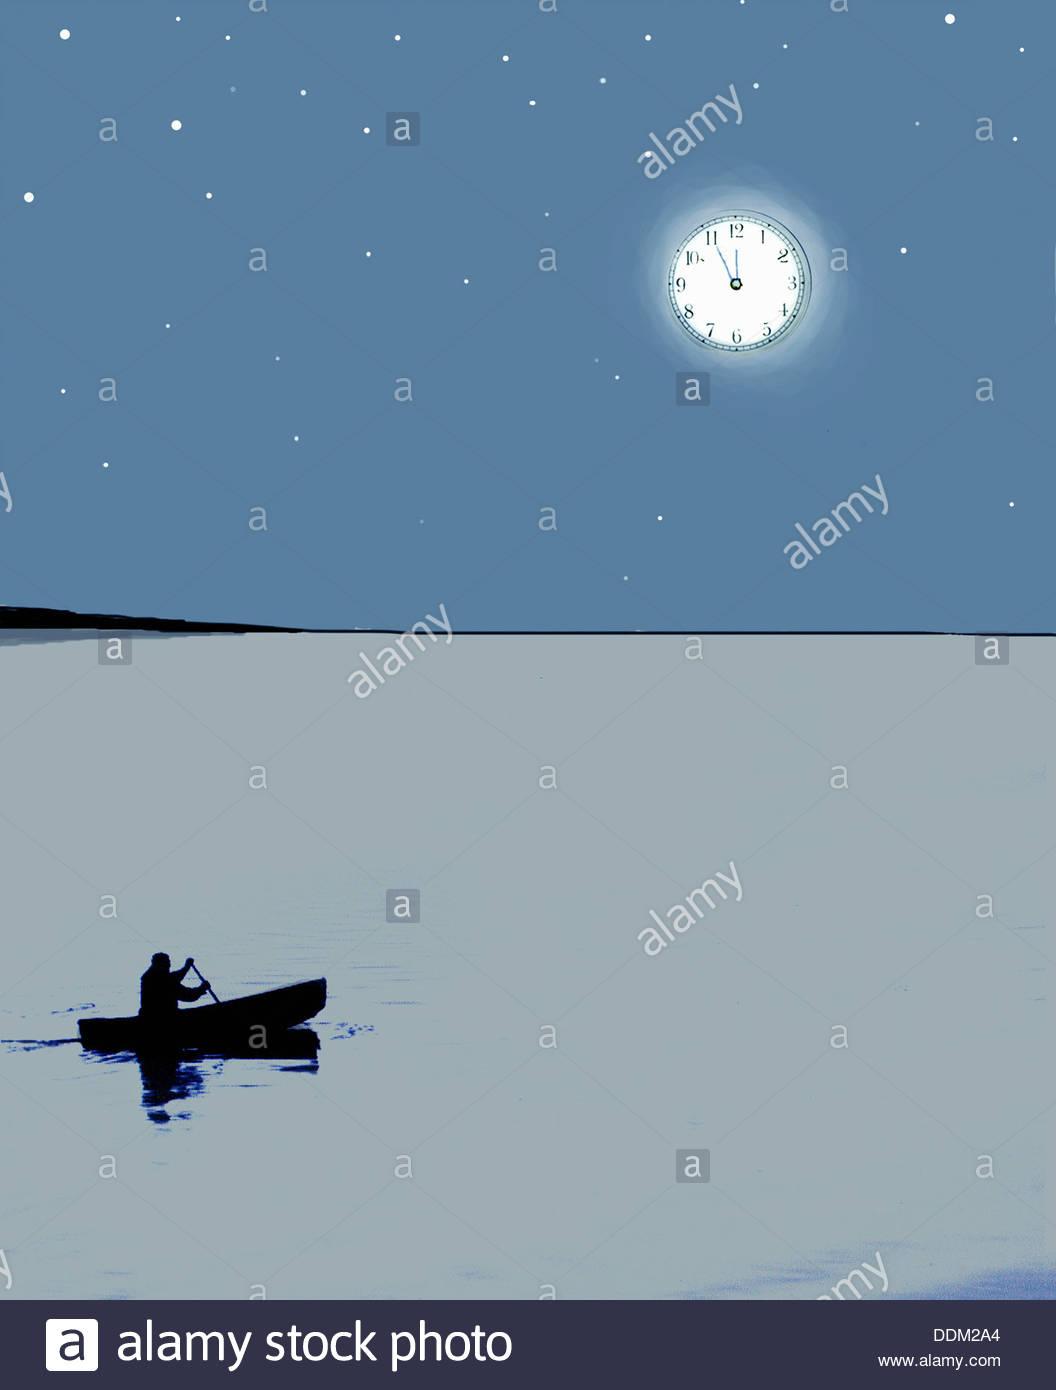 Man in canoe under clock moon at midnight - Stock Image